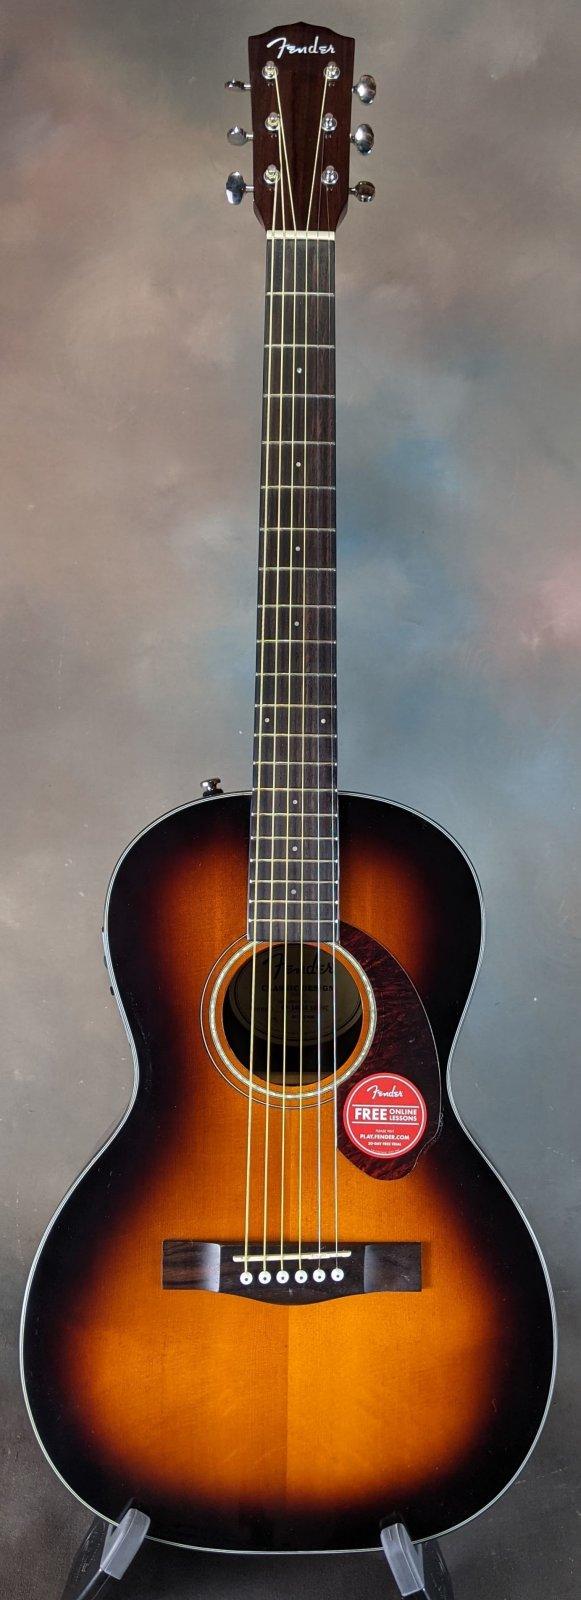 Fender CP-140SE Parlor Guitar w/ Fishman Presys Pickup, Sunburst, w/ Hardshell Case